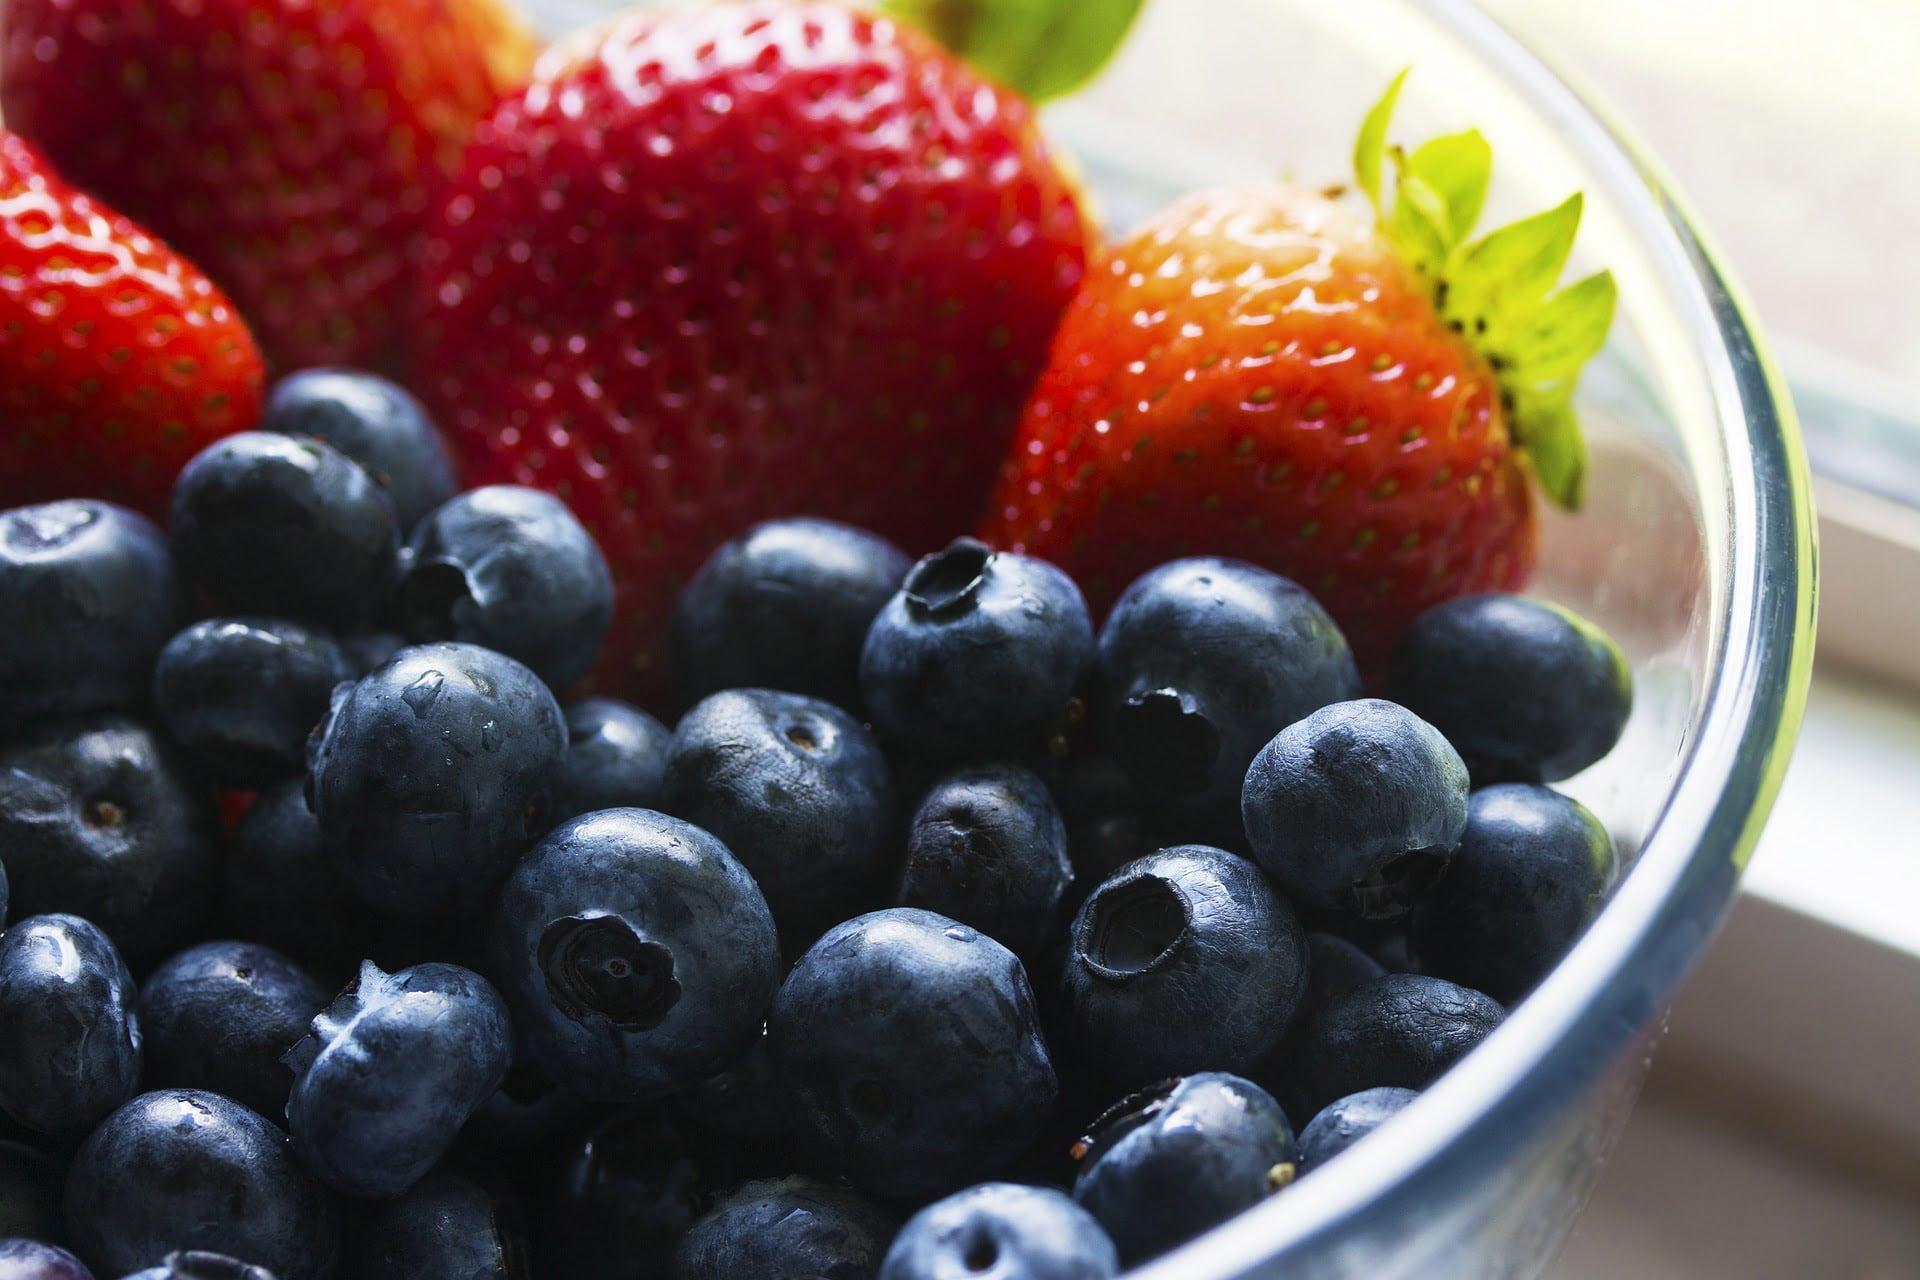 berries-1851148_1920